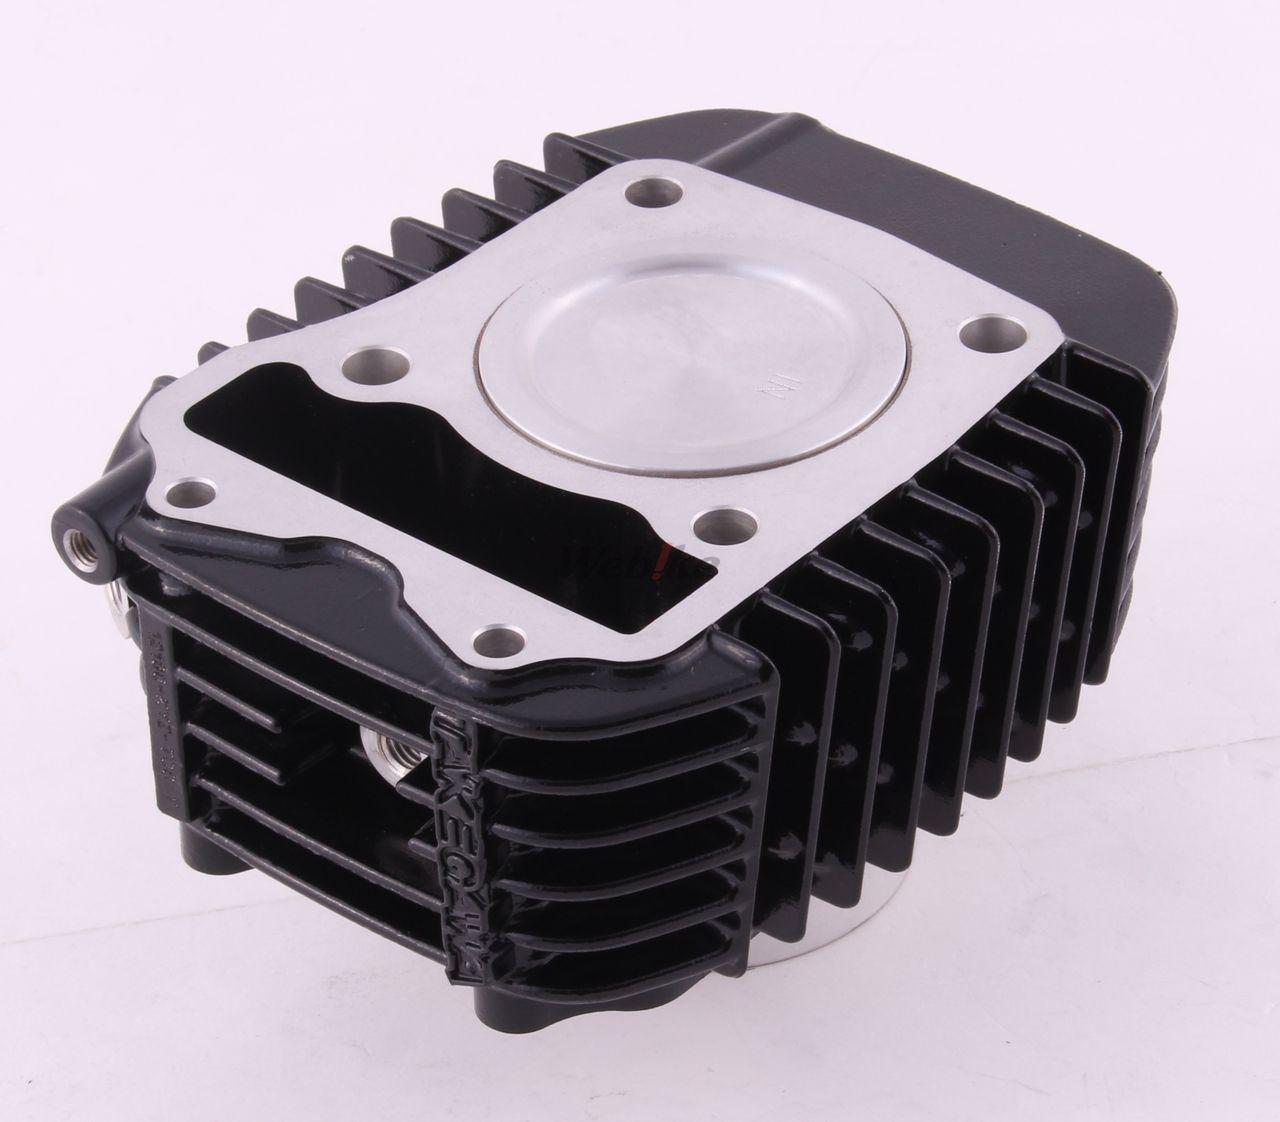 【SP武川】S stage加大缸徑套件(181cc不含 Sports凸輪軸) - 「Webike-摩托百貨」